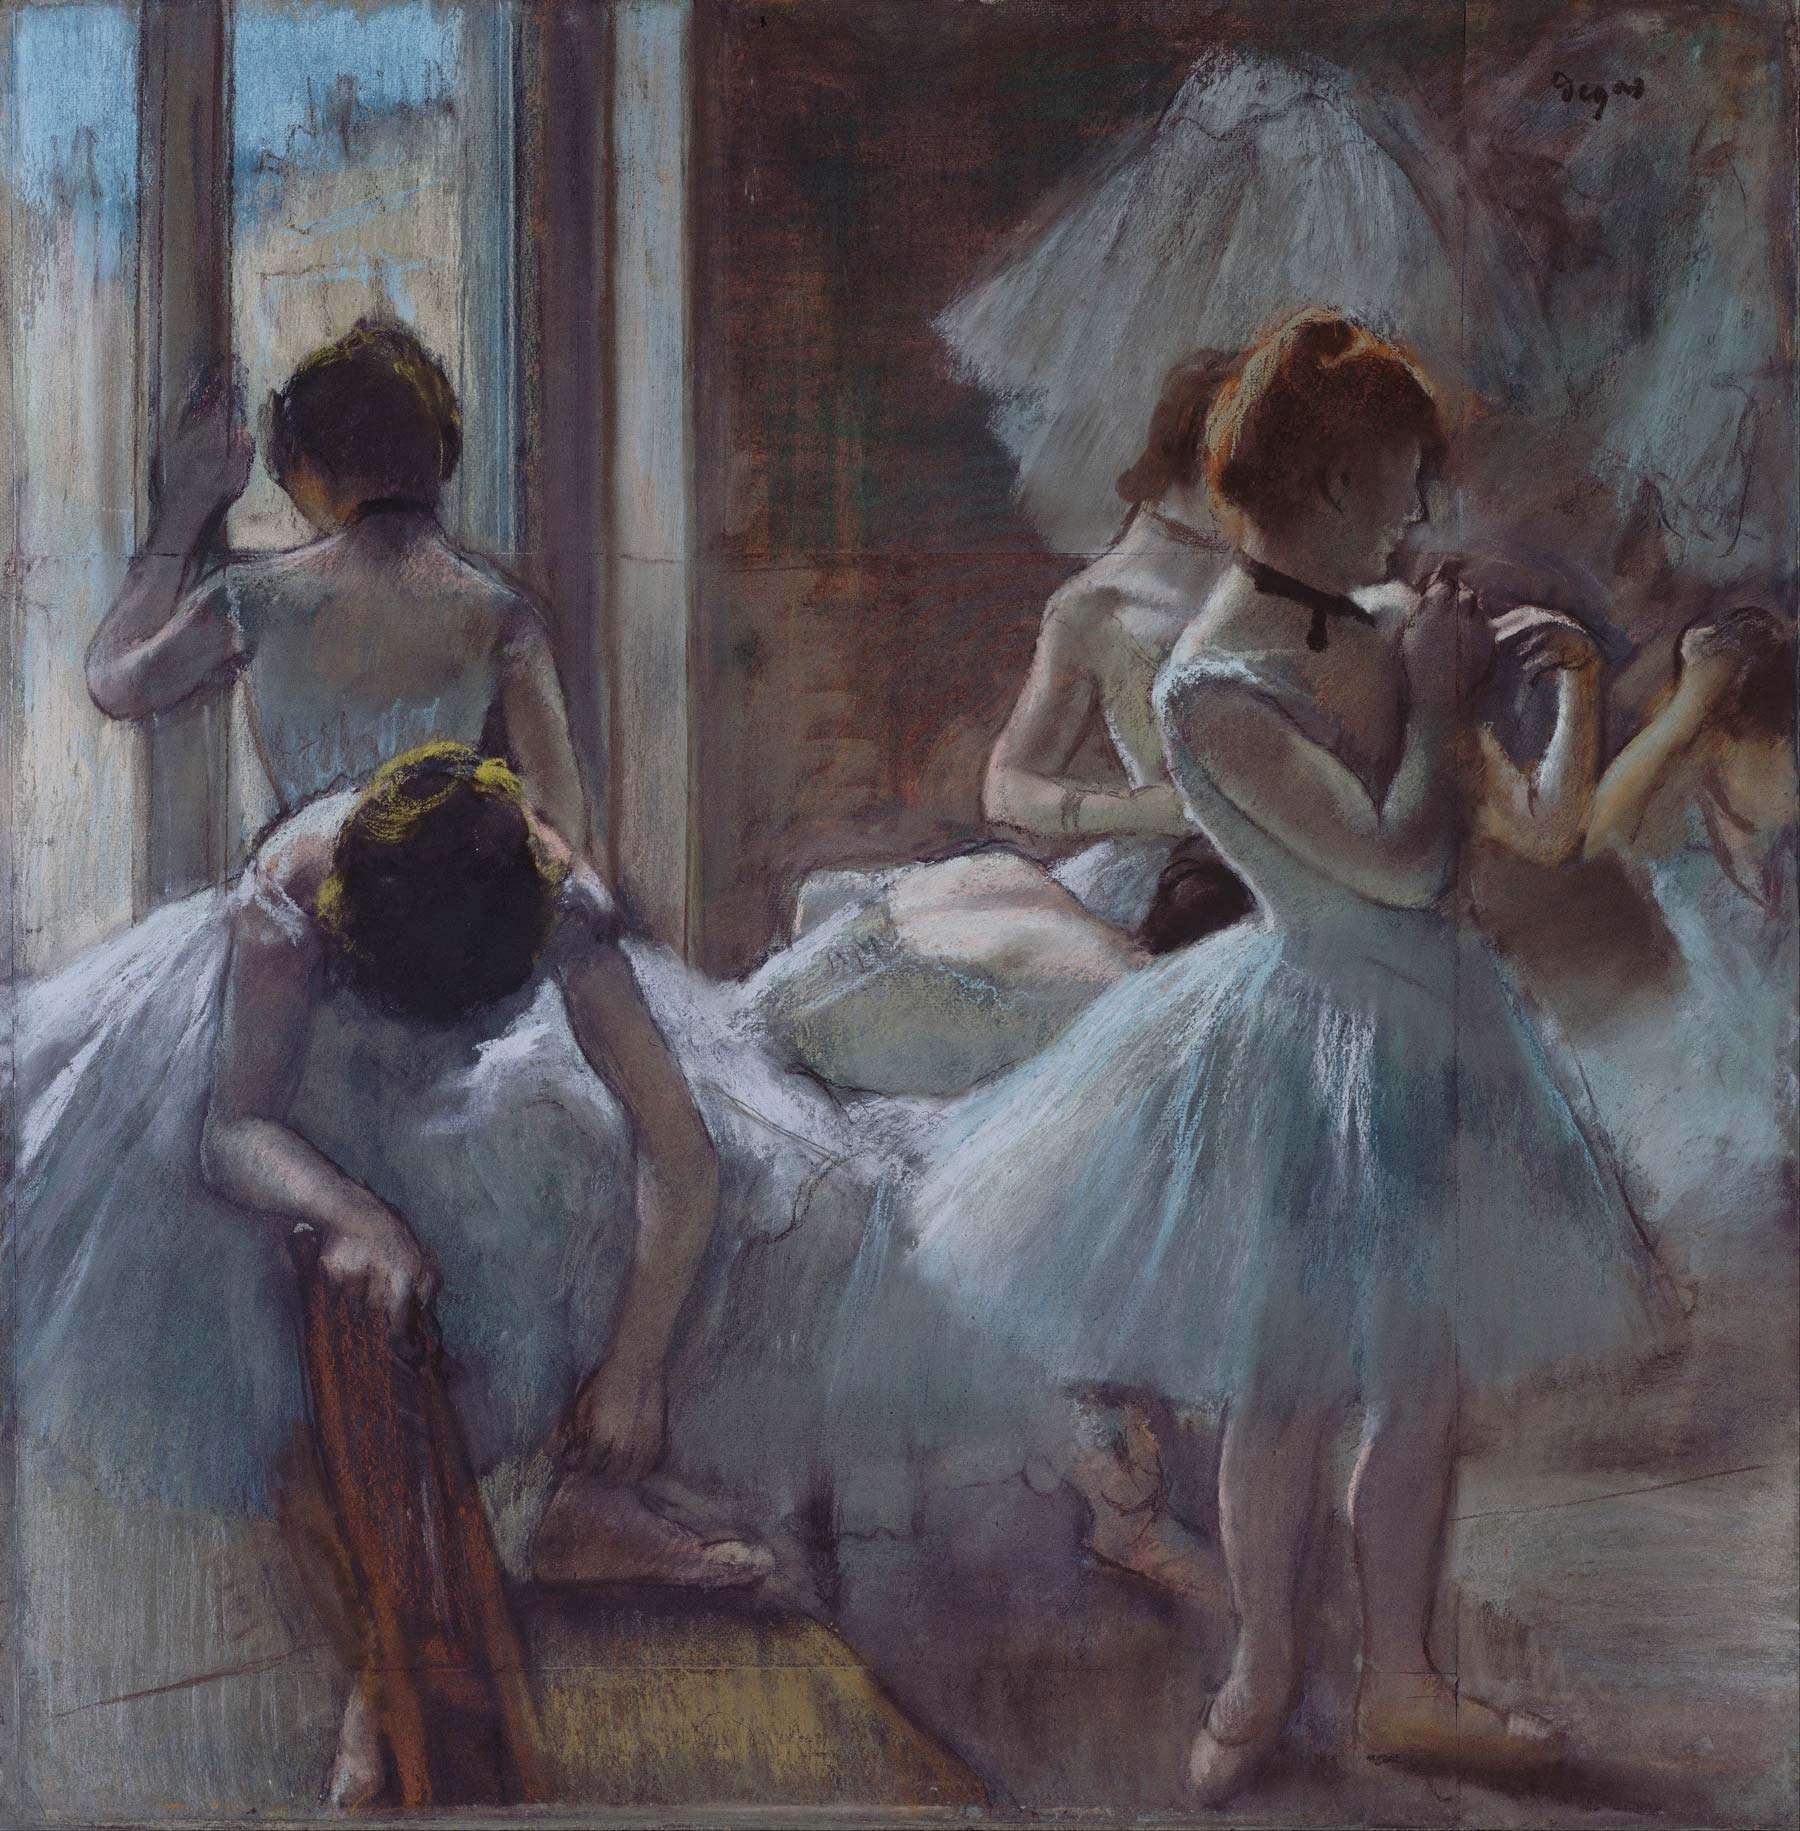 Ballerine dipinto del Romanticismo